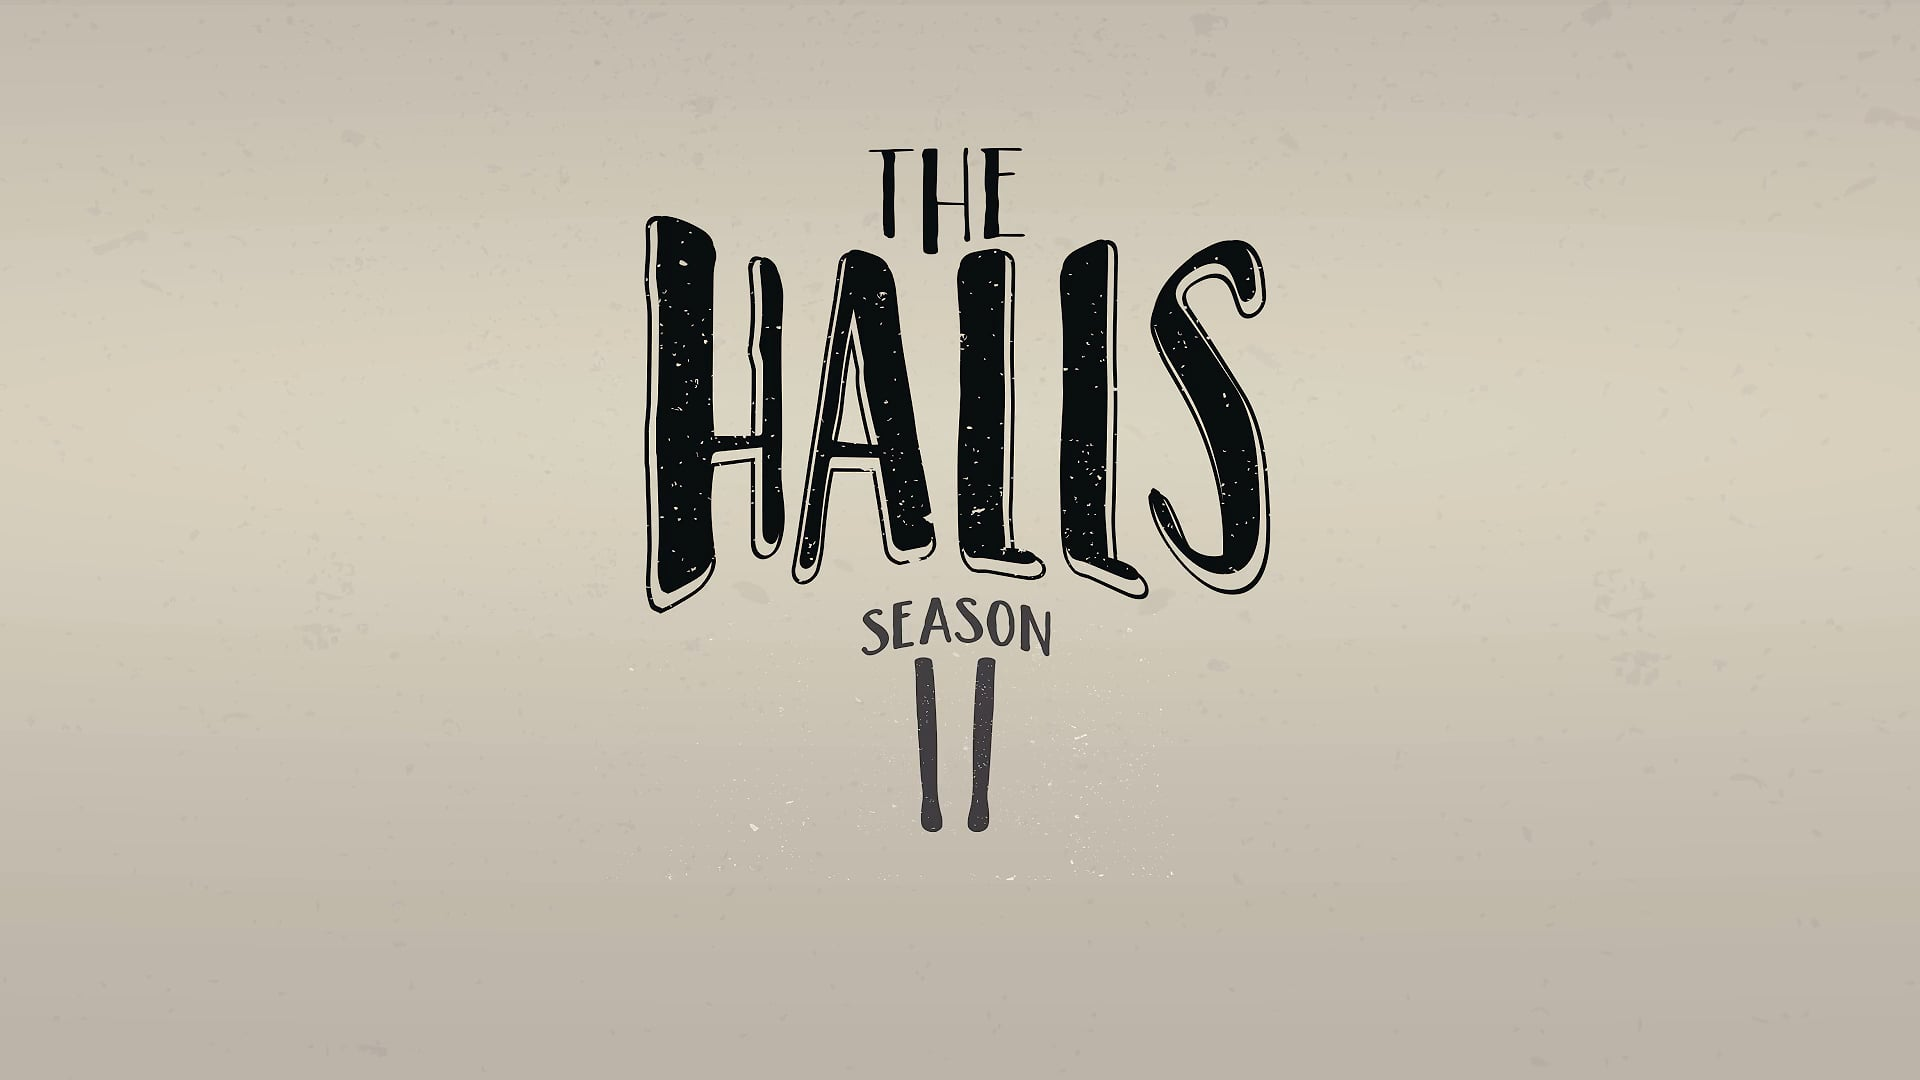 TheHalls2Episode2